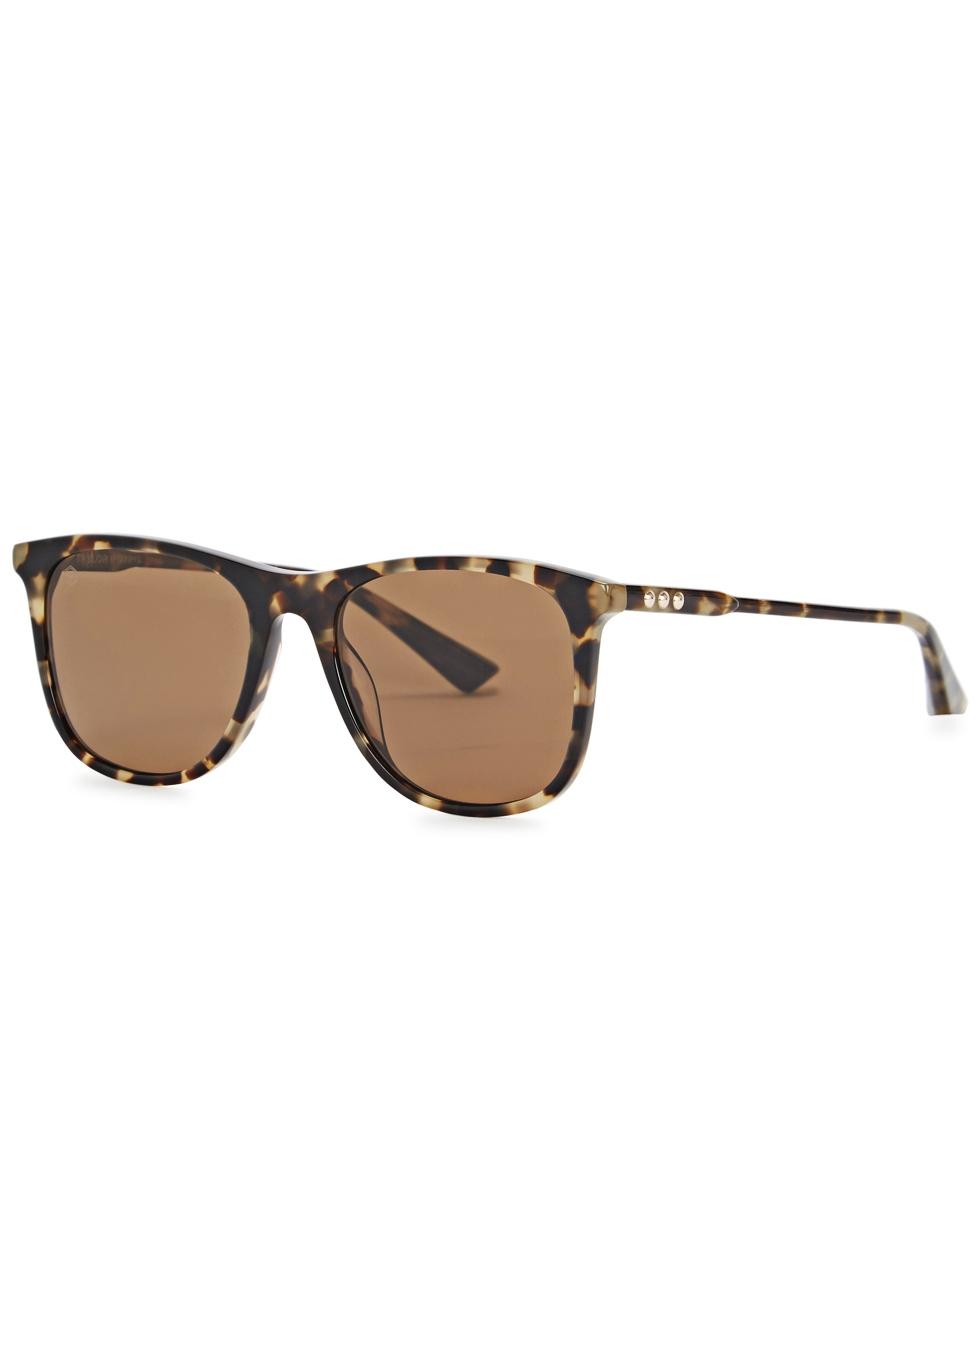 TAYLOR MORRIS EYEWEAR Raleigh Wayfarer-Style Sunglasses in Havana